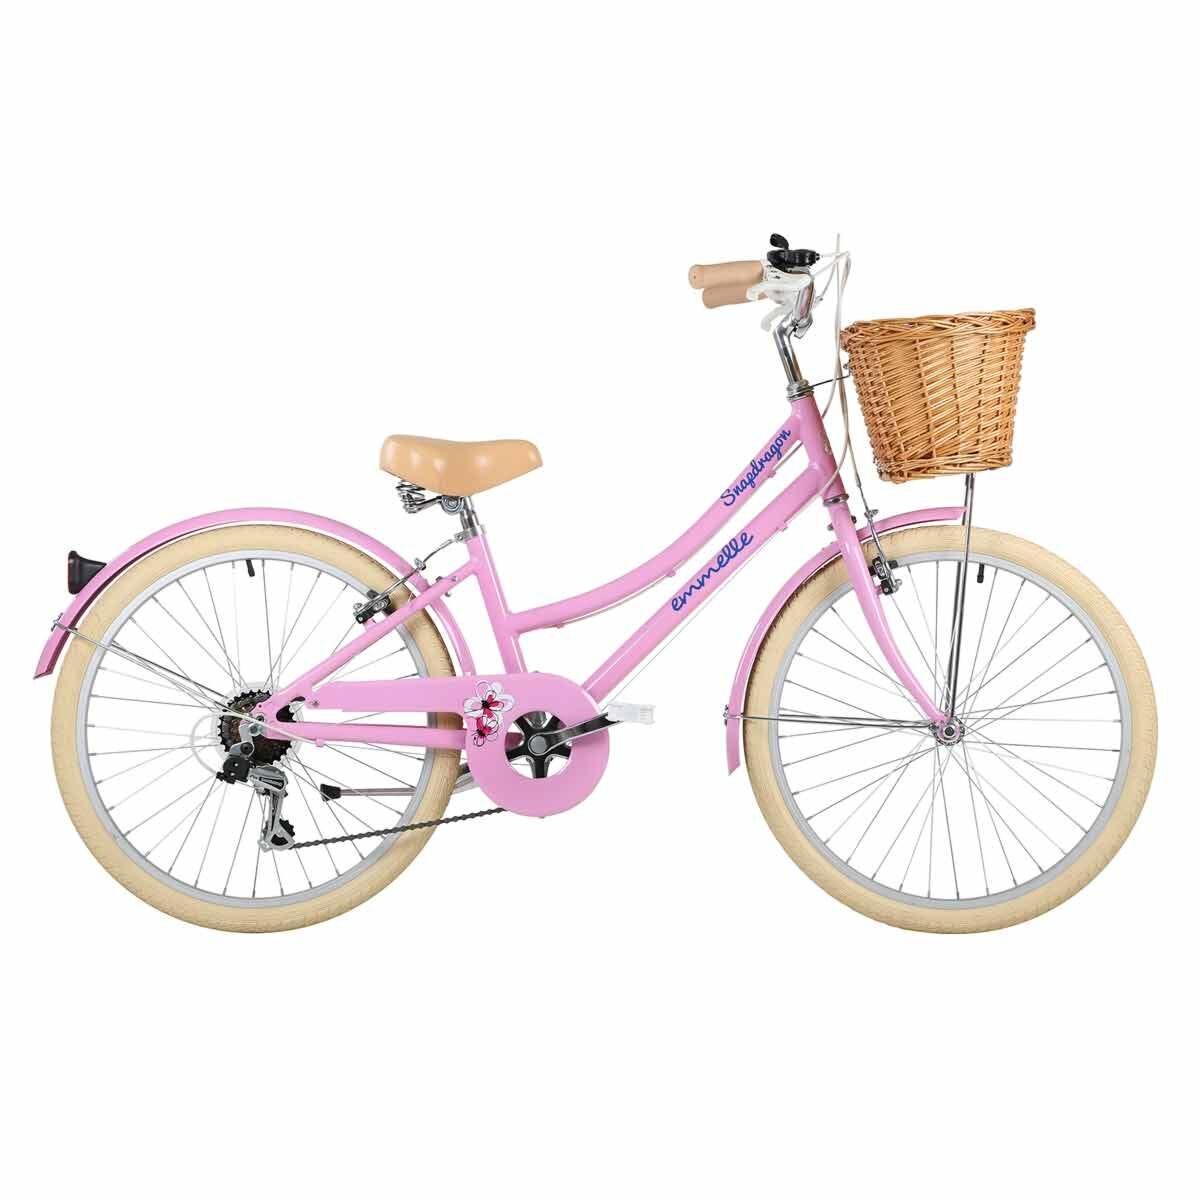 Emmelle Snapdragon Girls Bike 24 Inch Wheel